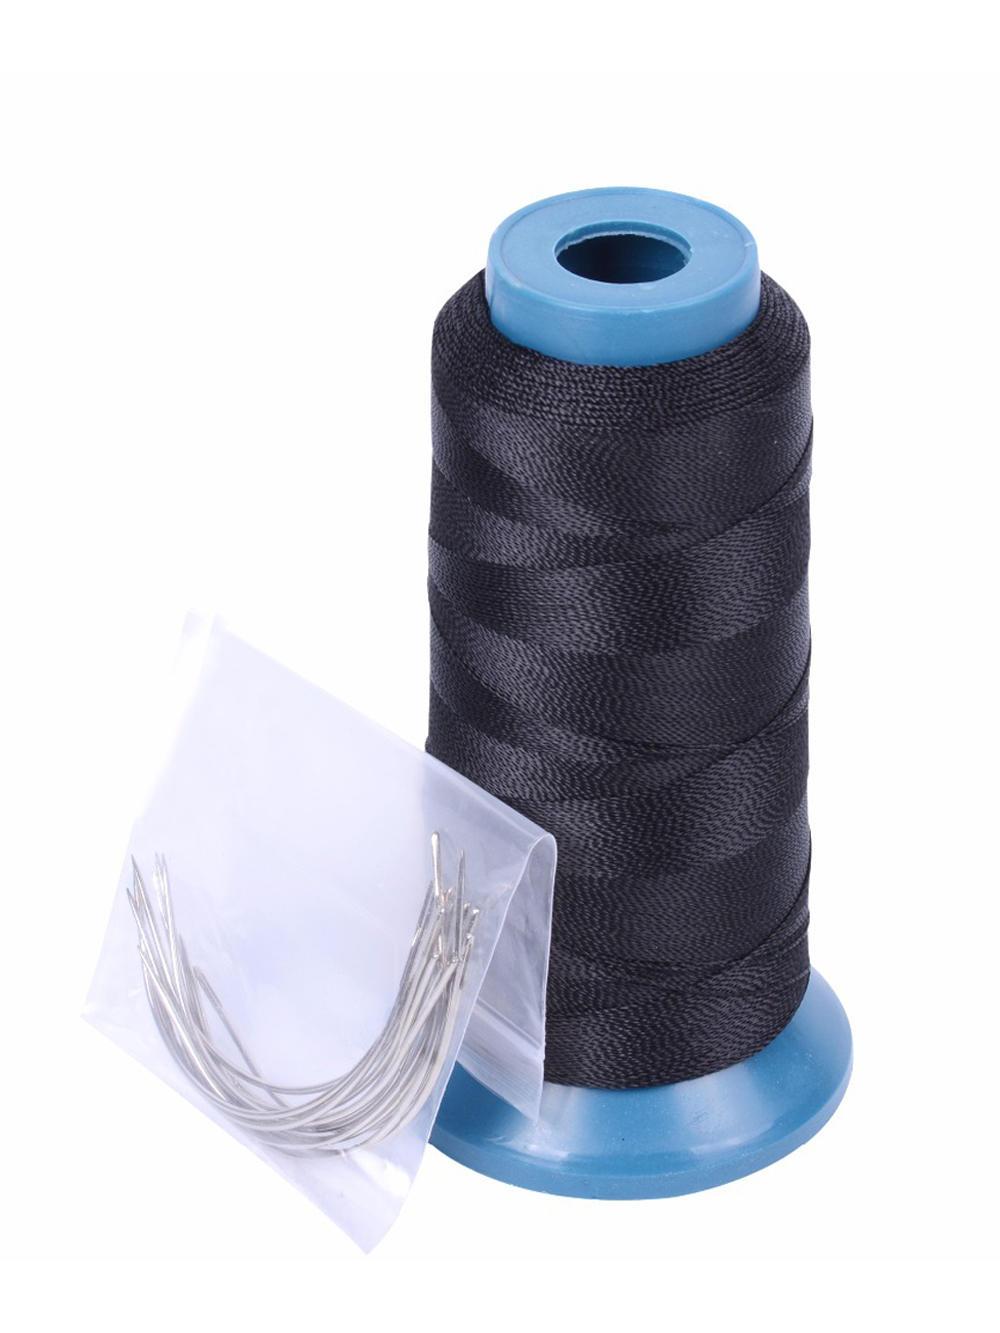 Hair-Weaving-Thread Weaving-Needles/C-Type Needles/curved-Needle 1-Roll Nine-Colors High-Intensity